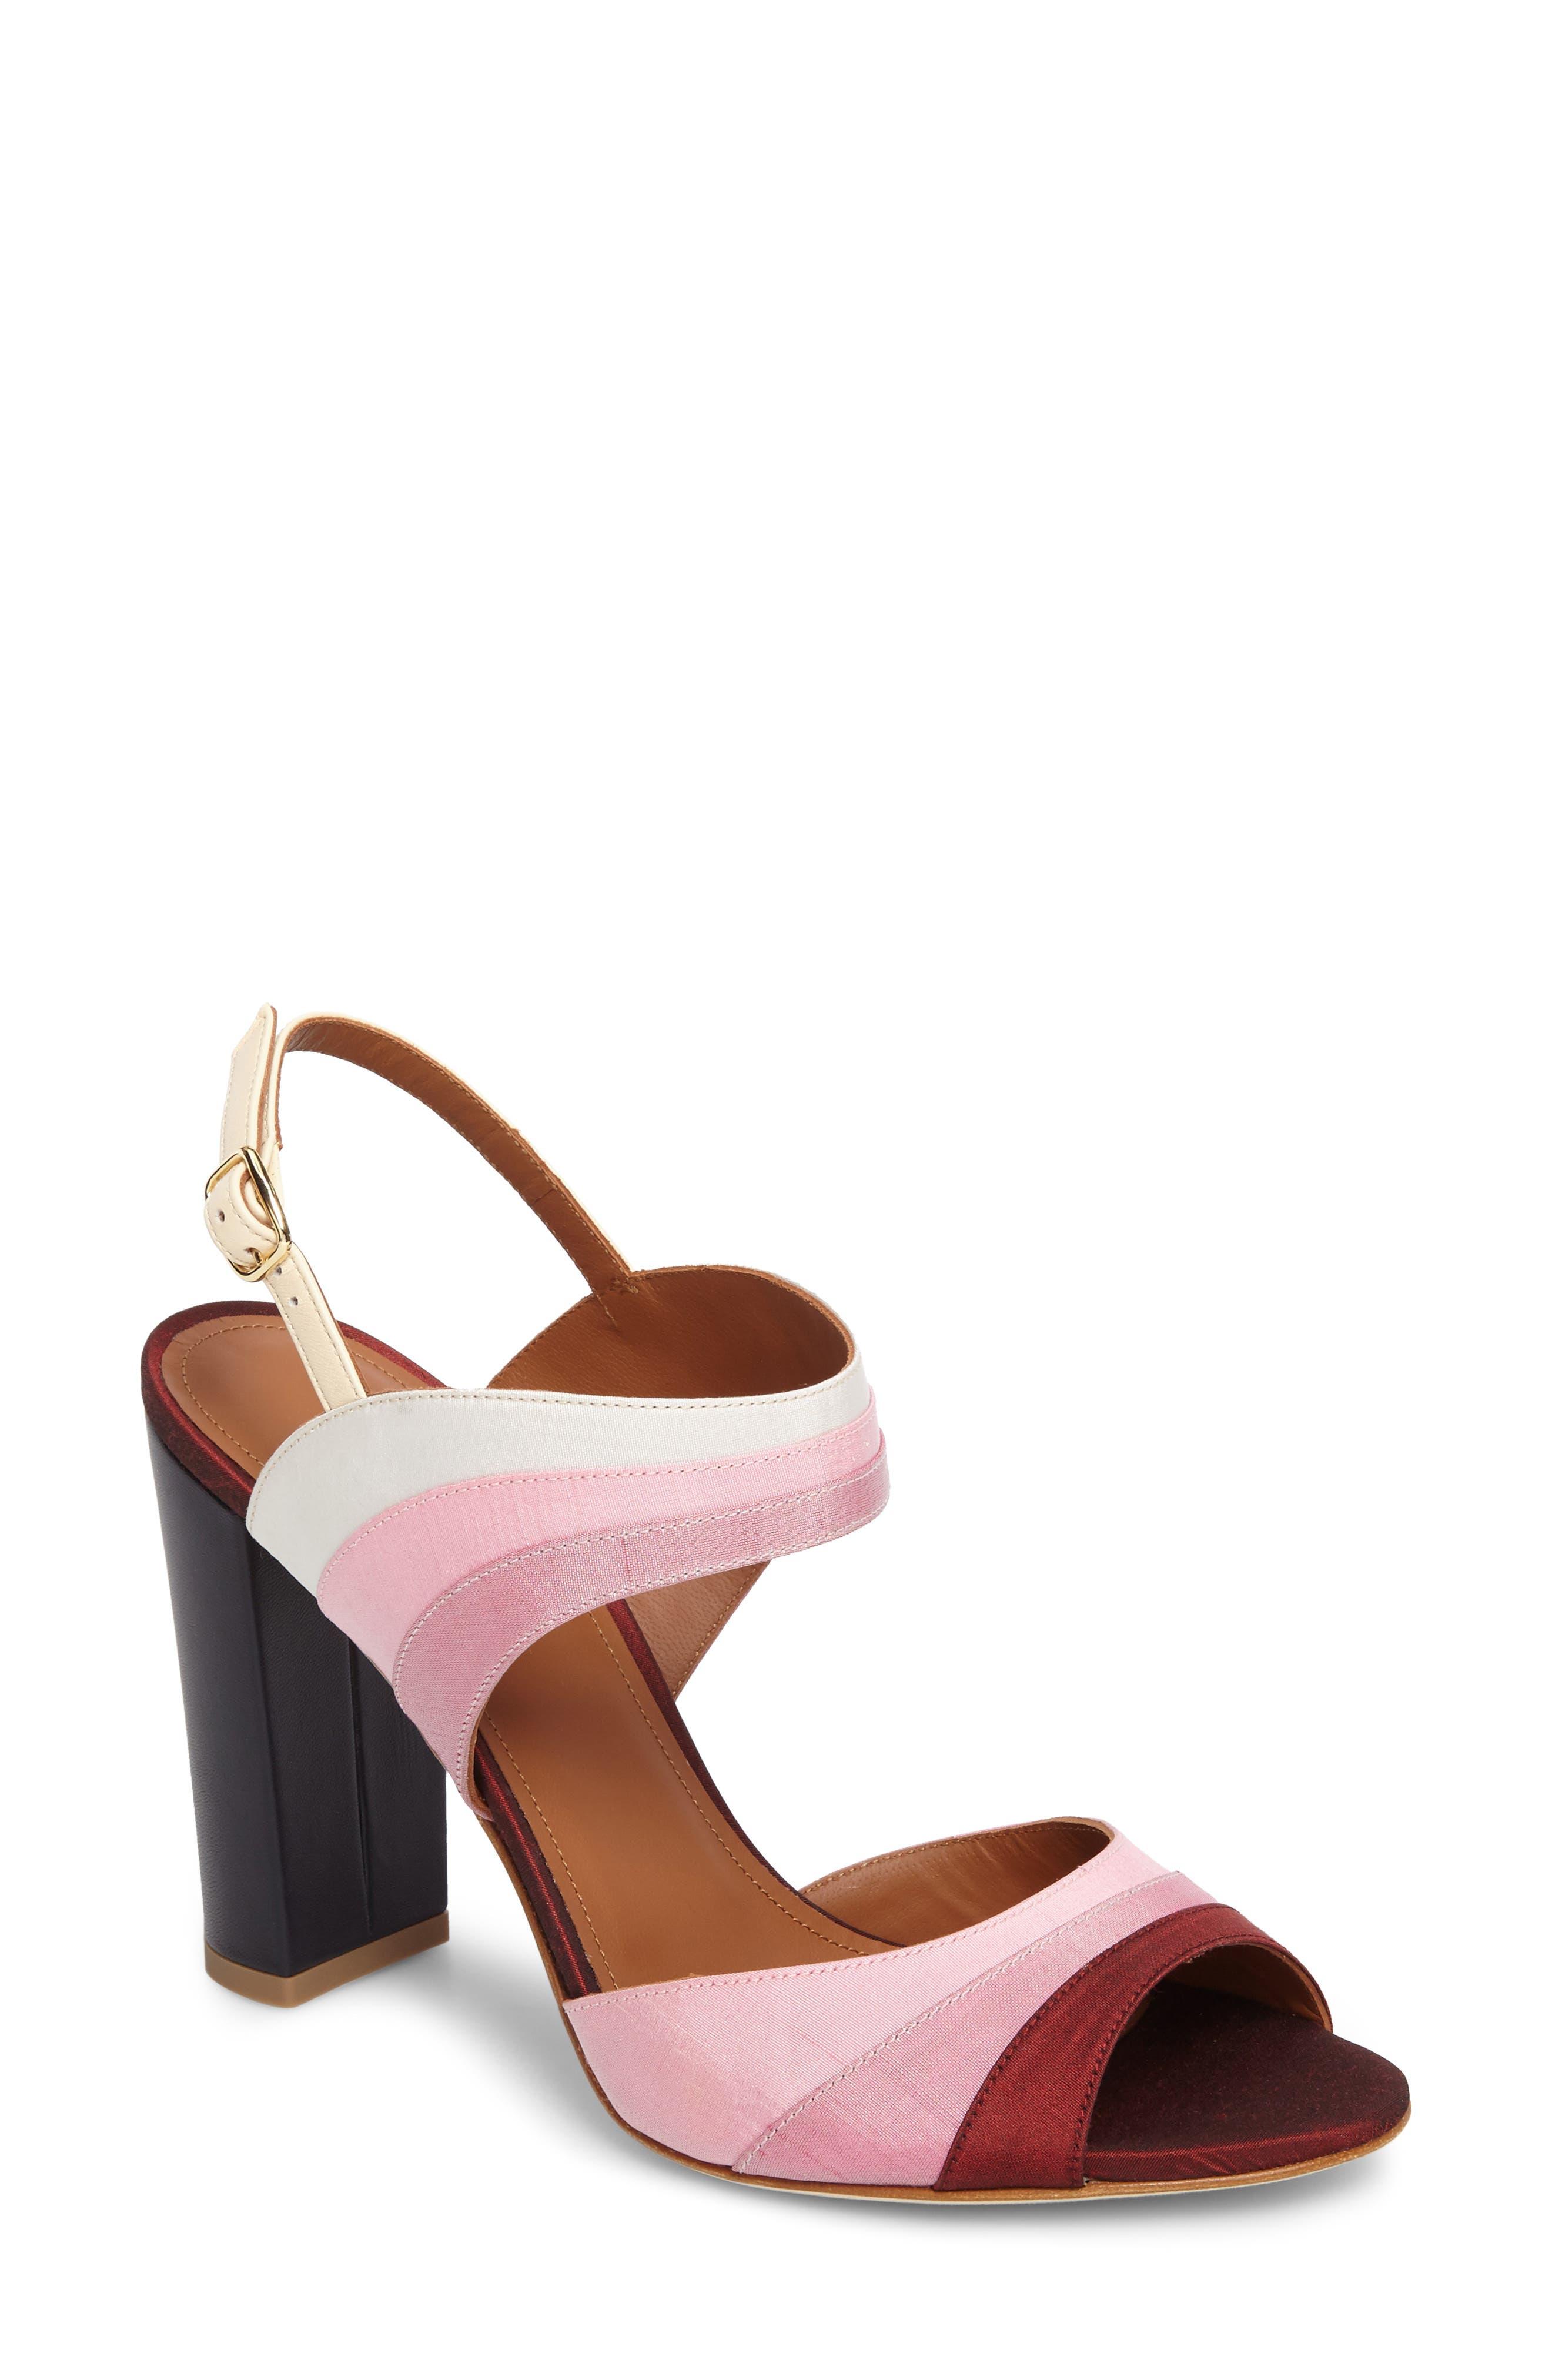 Anita Ombré Slingback Sandal,                         Main,                         color,